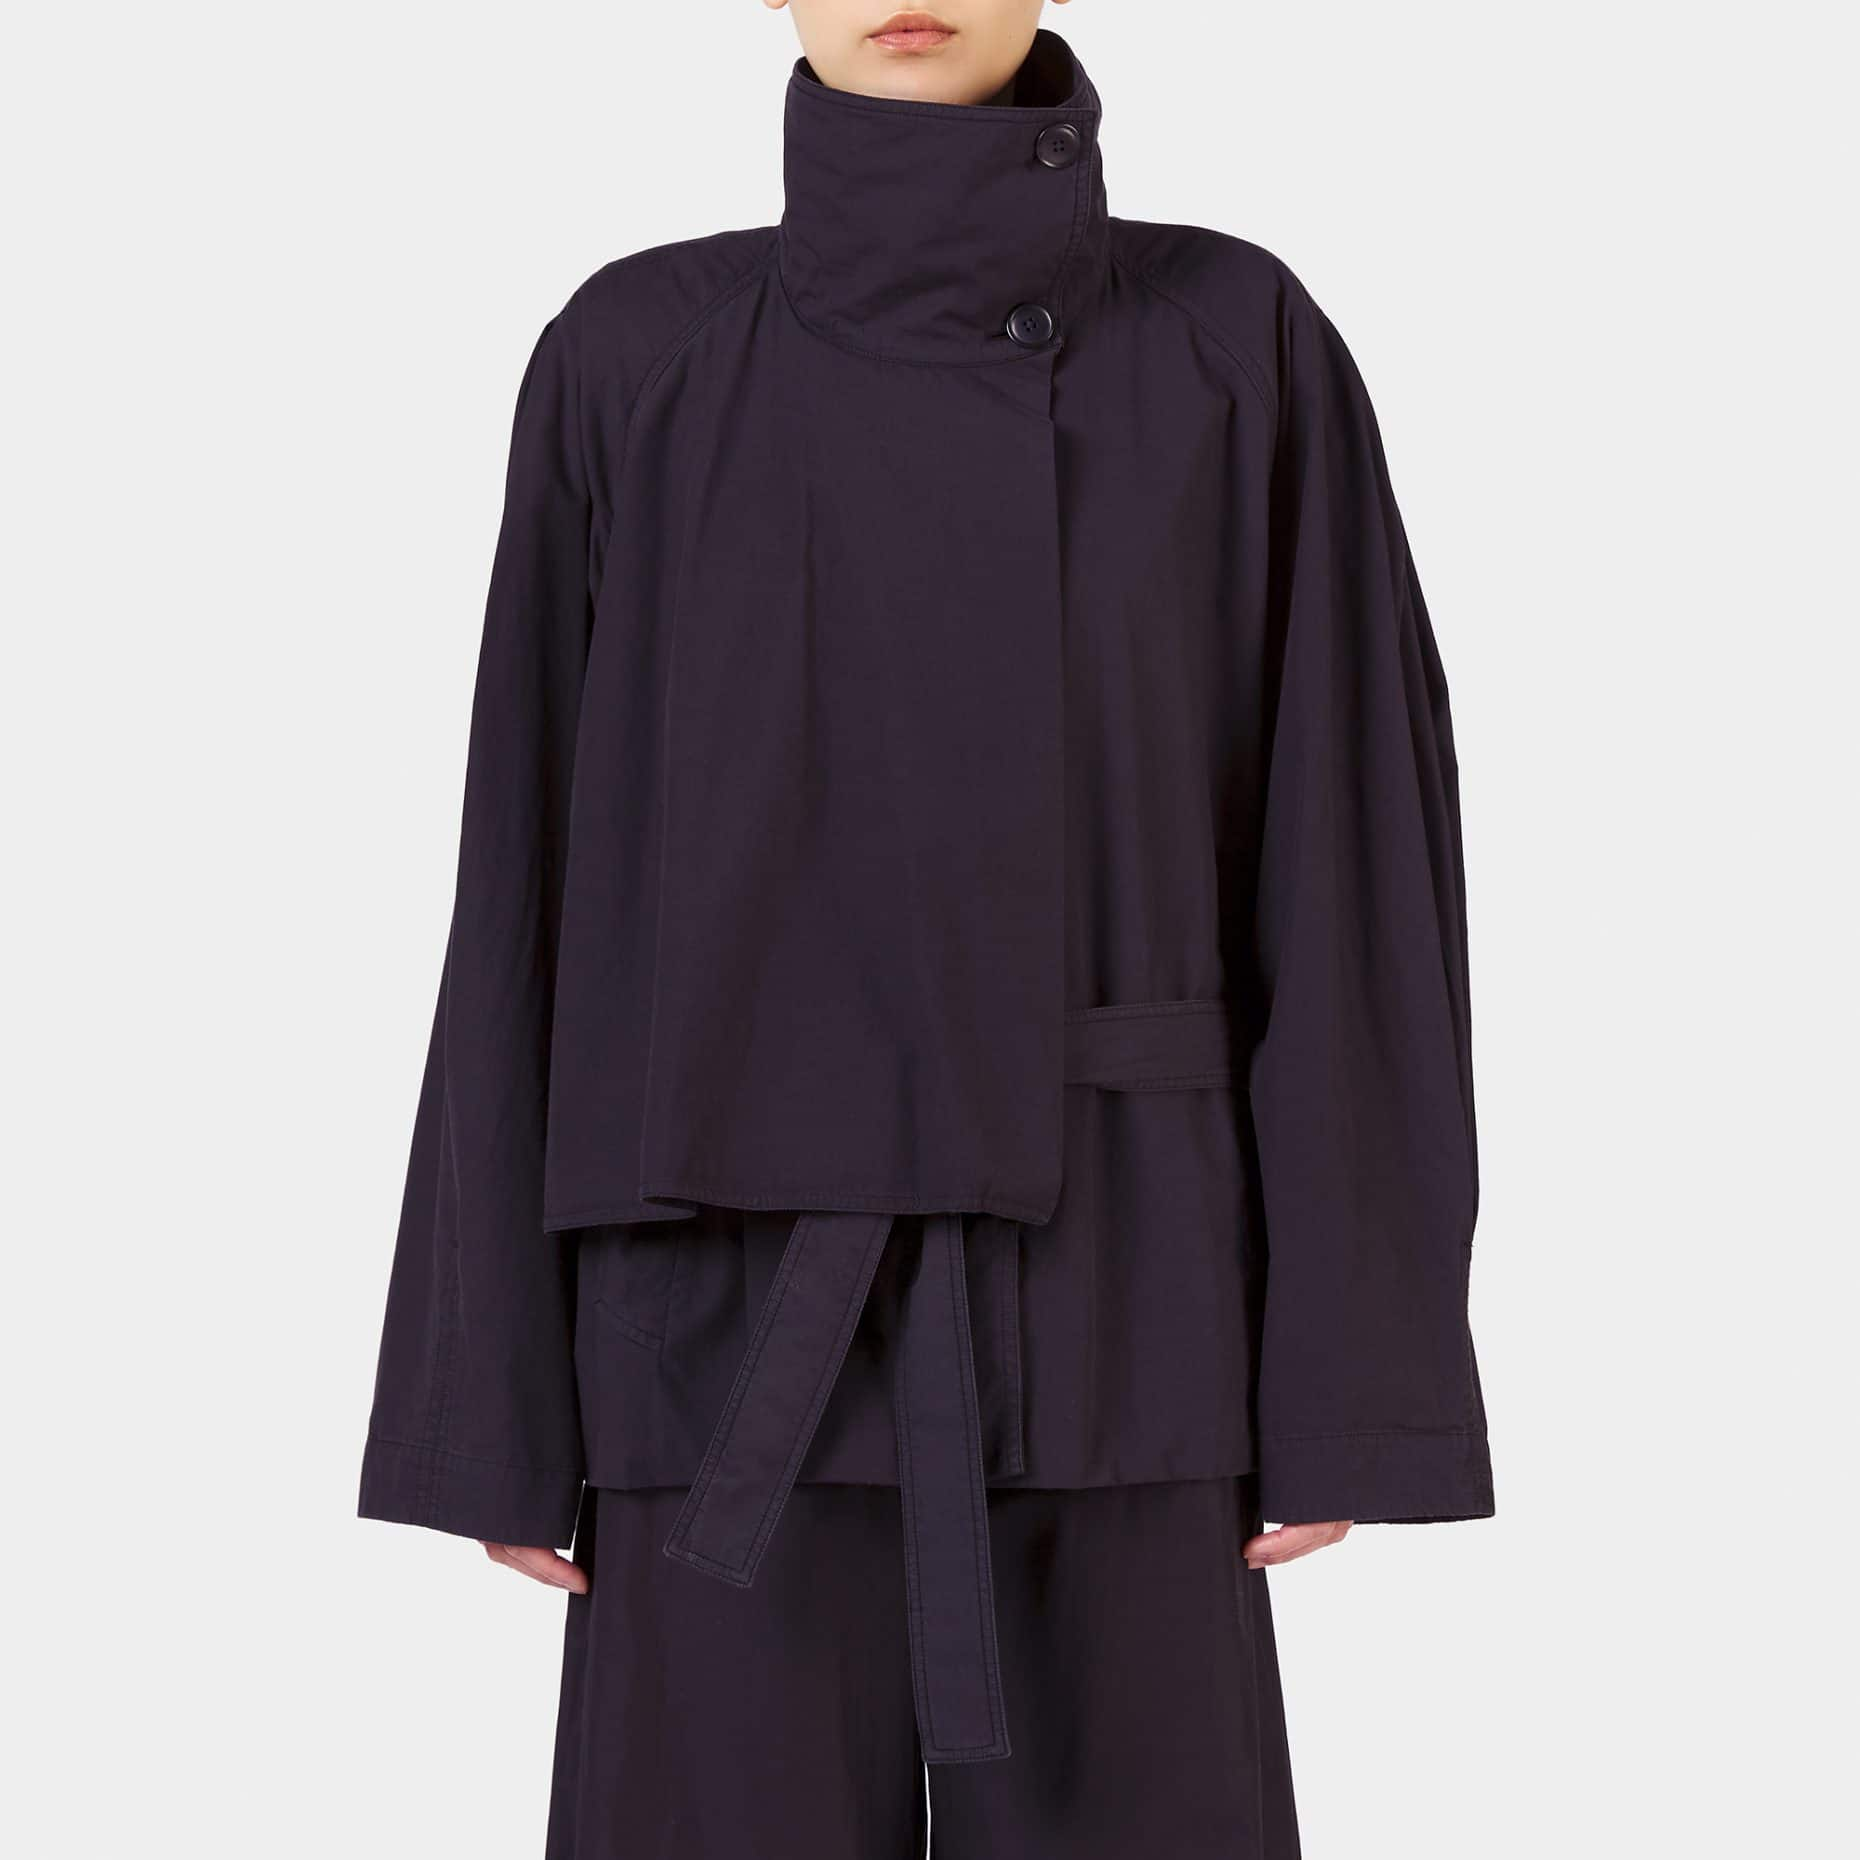 Lemaire High Collar Blouson Black